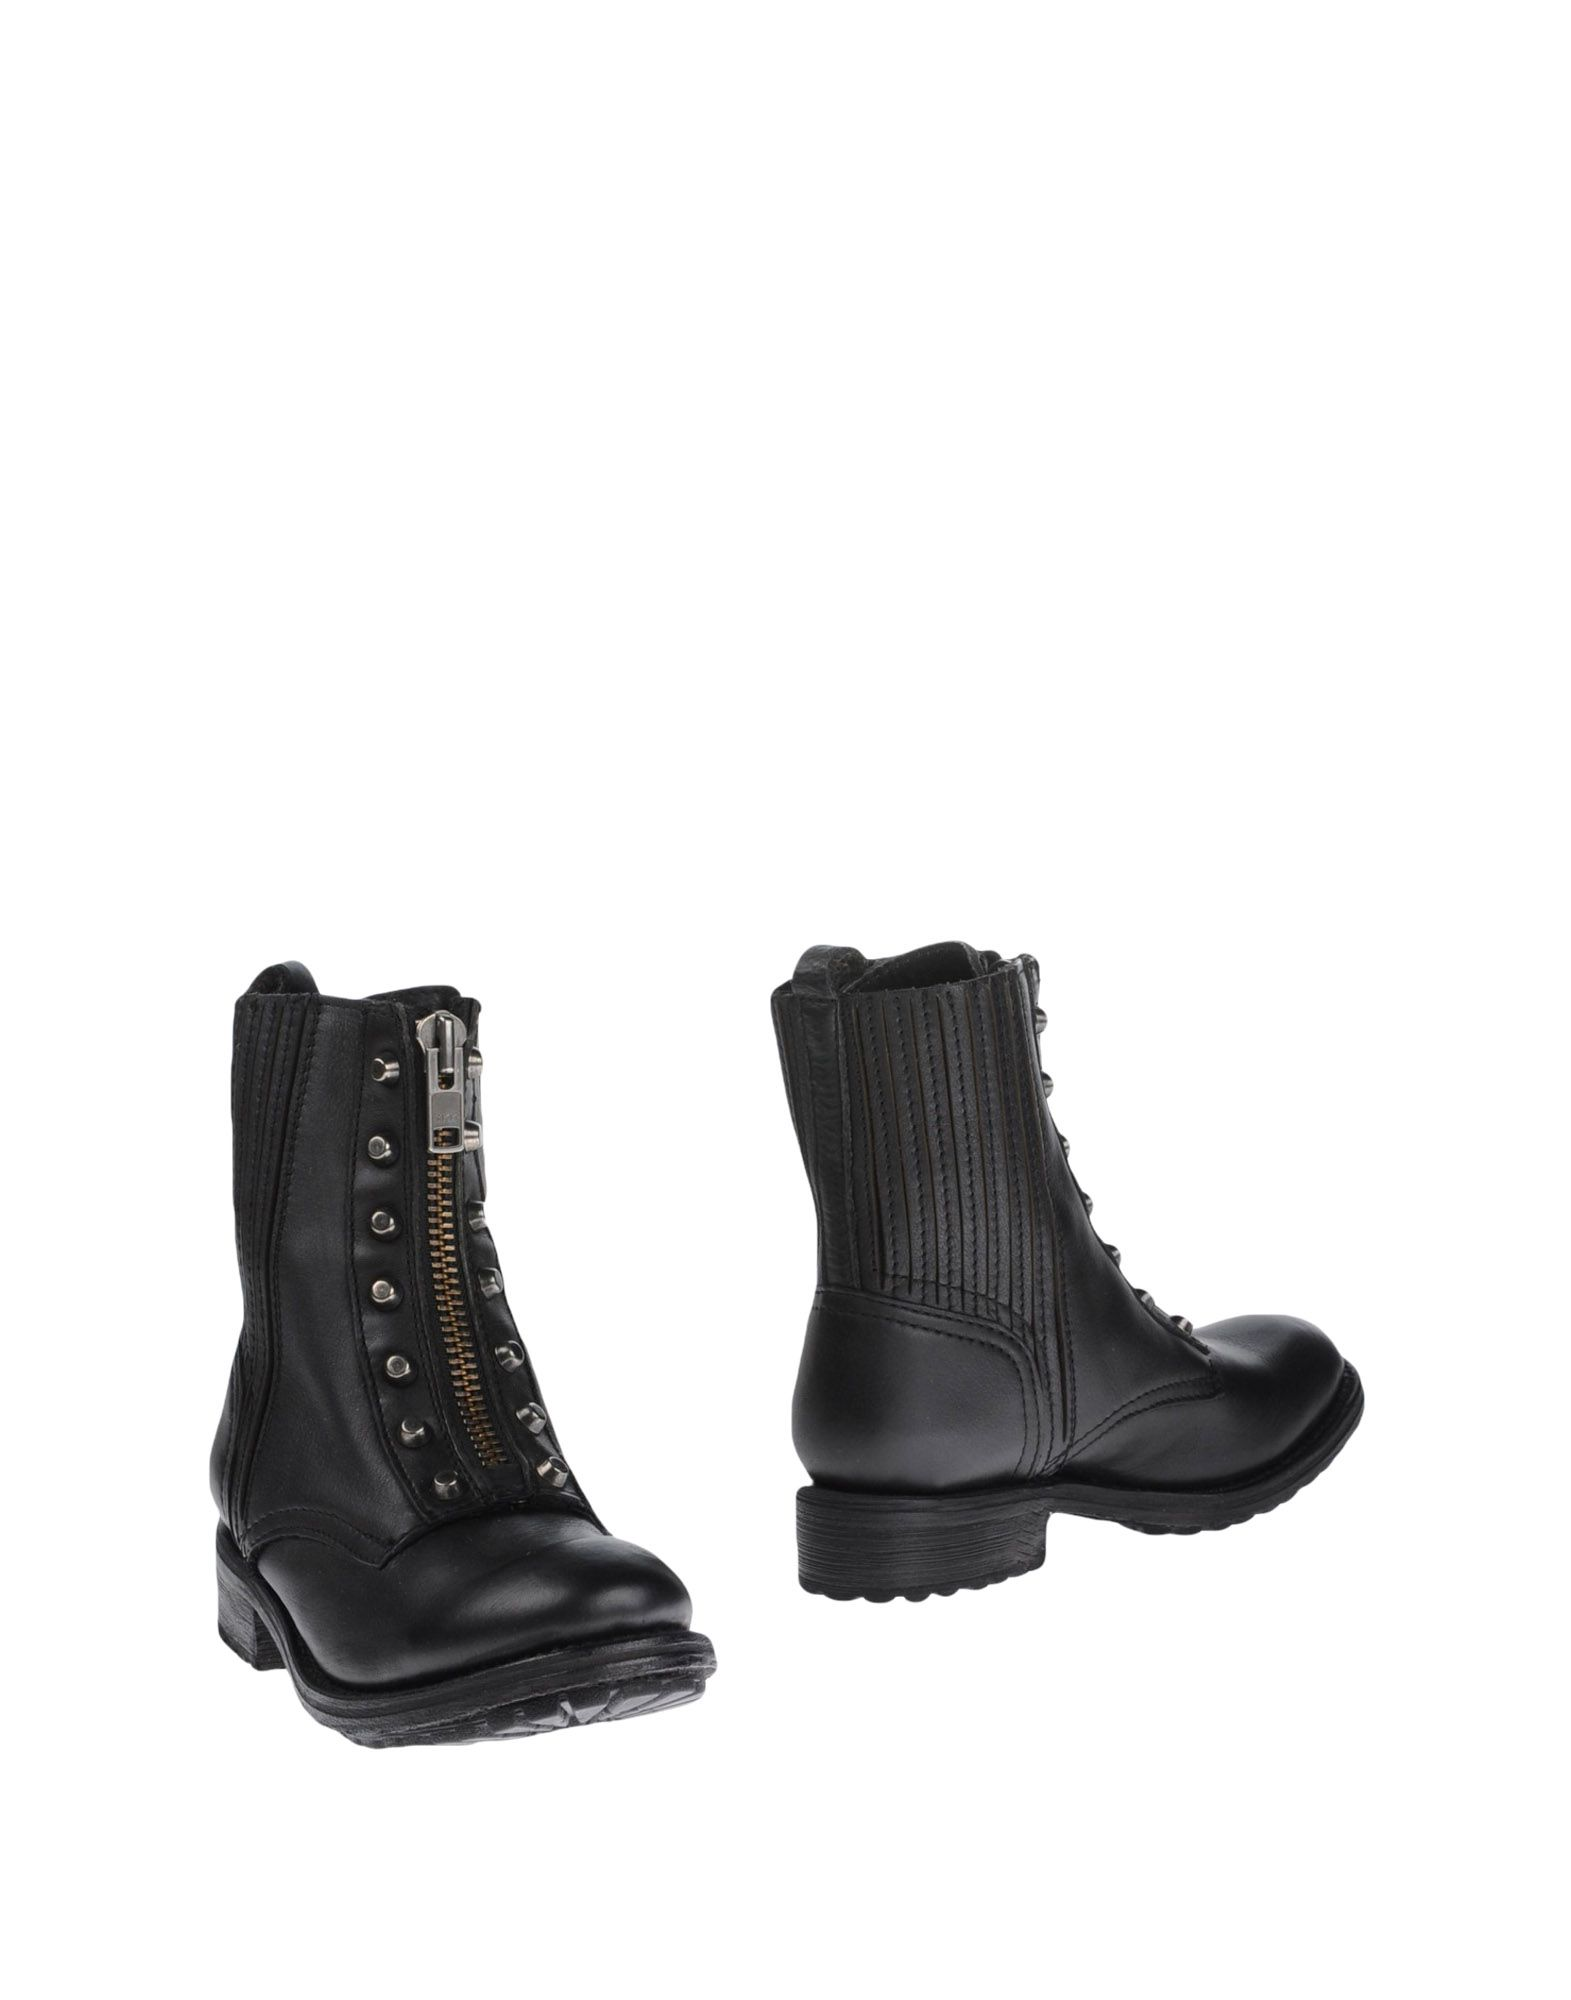 Boots Similar